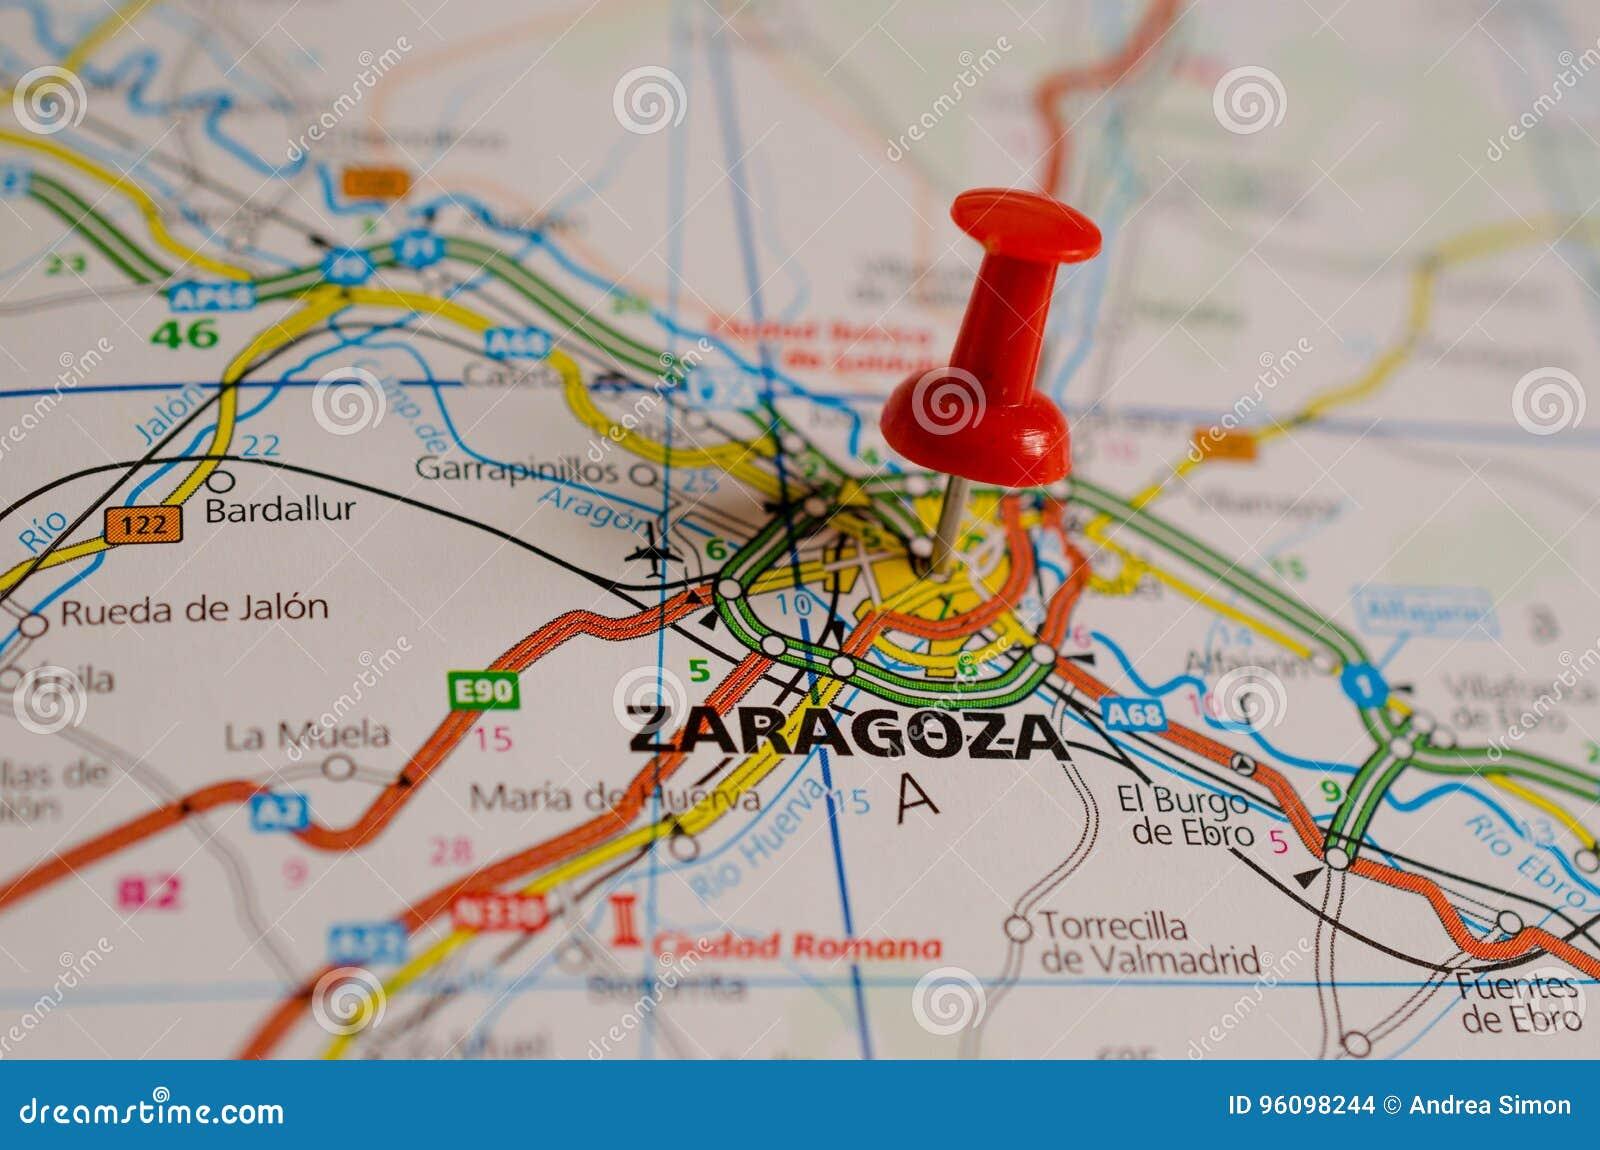 Zaragoza Map Of Spain.Zaragoza On Map Stock Photo Image Of Visit Madrid Tourism 96098244